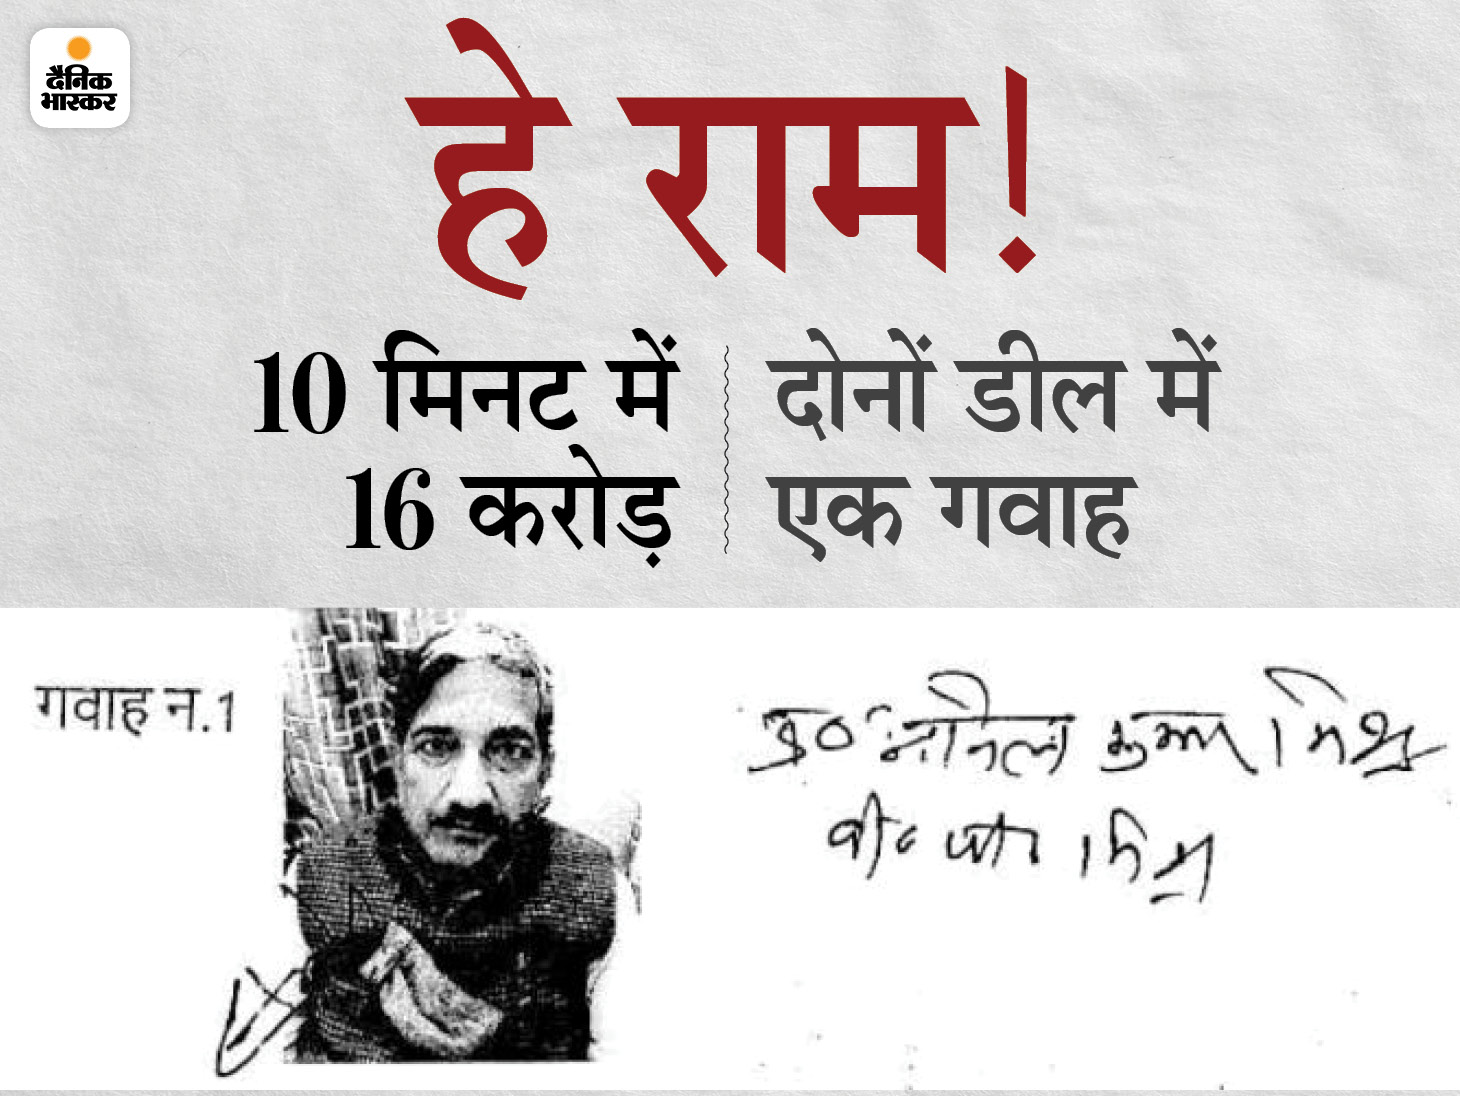 पूर्व मंत्री का सवाल- 2 करोड़ की जमीन 10 मिनट में 18.5 करोड़ की कैसे हो गई|अयोध्या,Ayodhya - Dainik Bhaskar